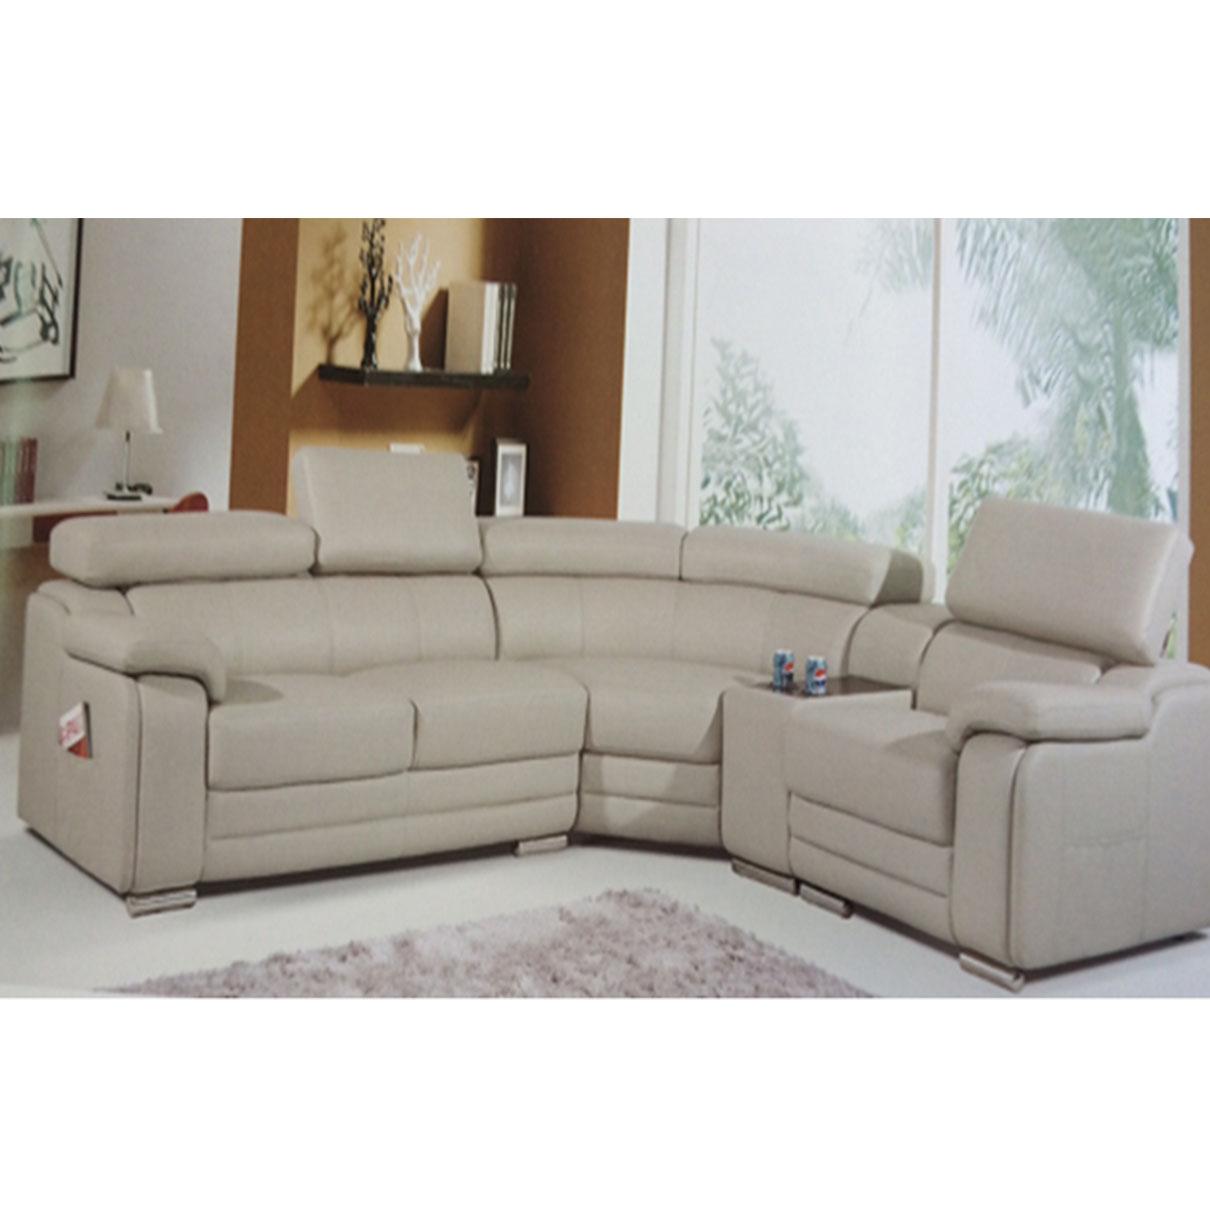 g27 decor and design lounge